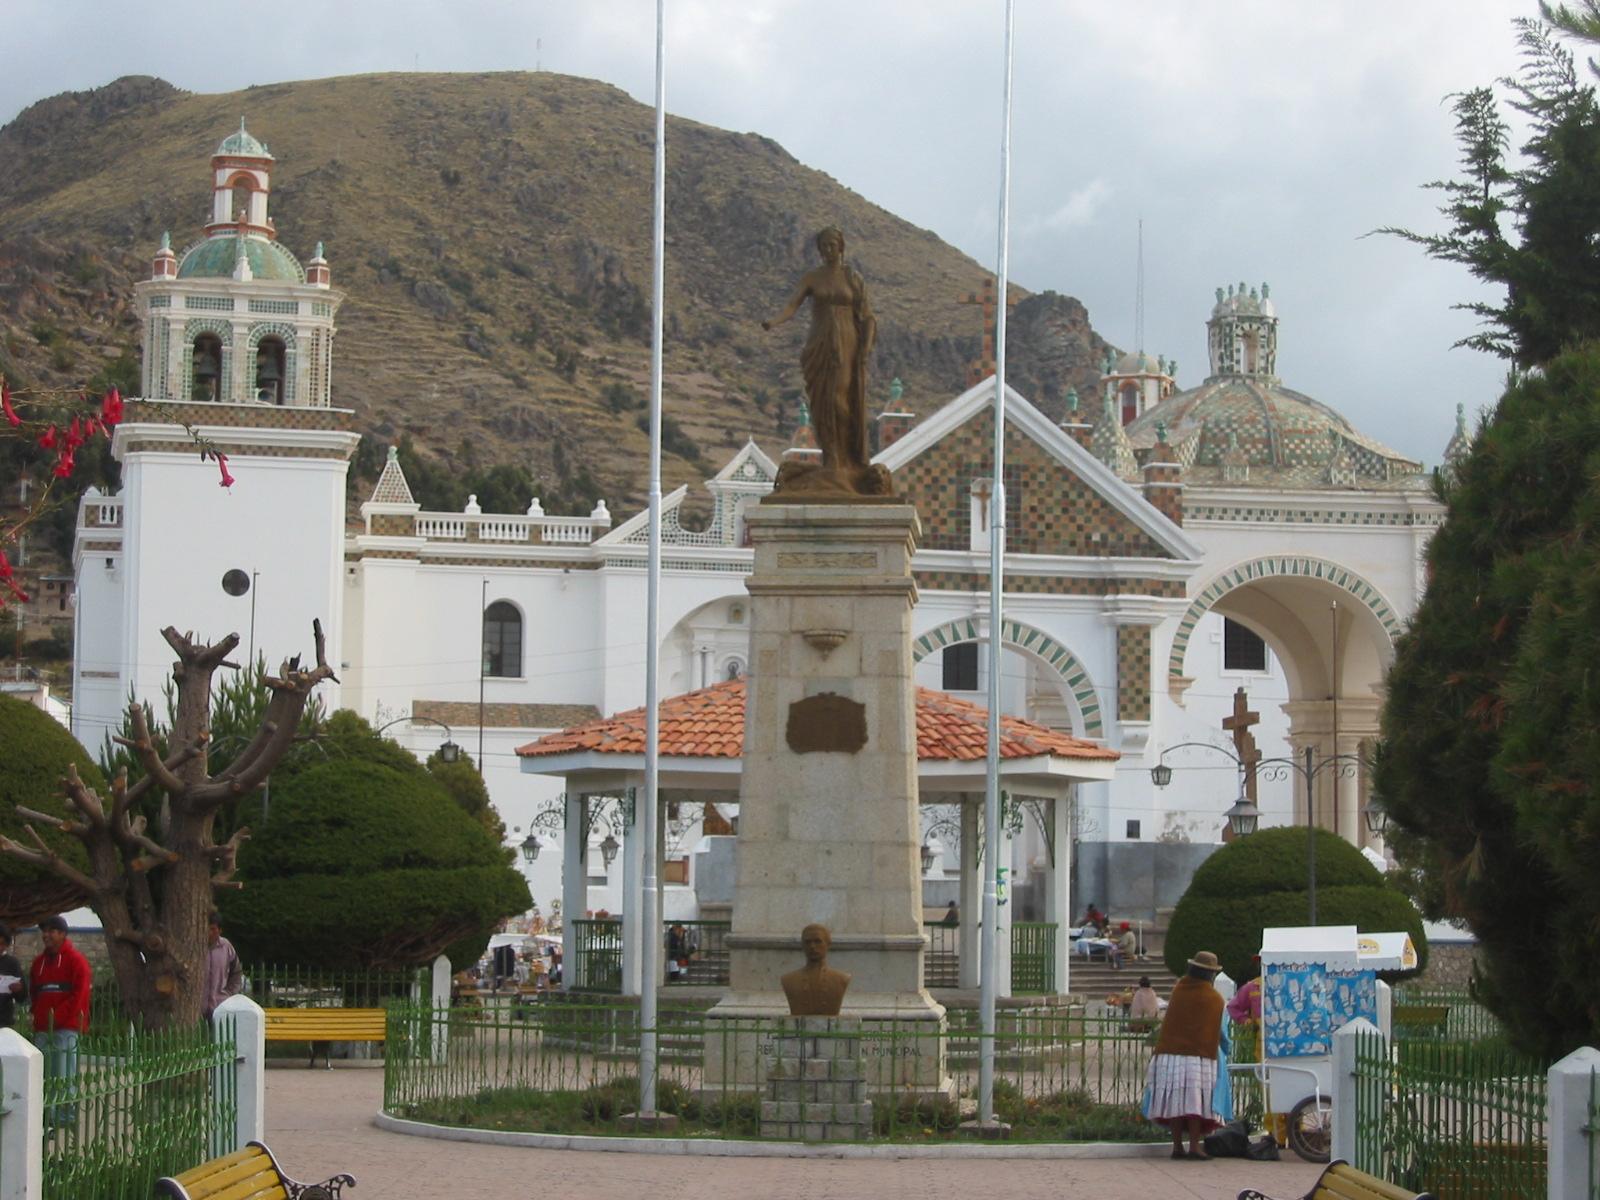 Copa town plaza